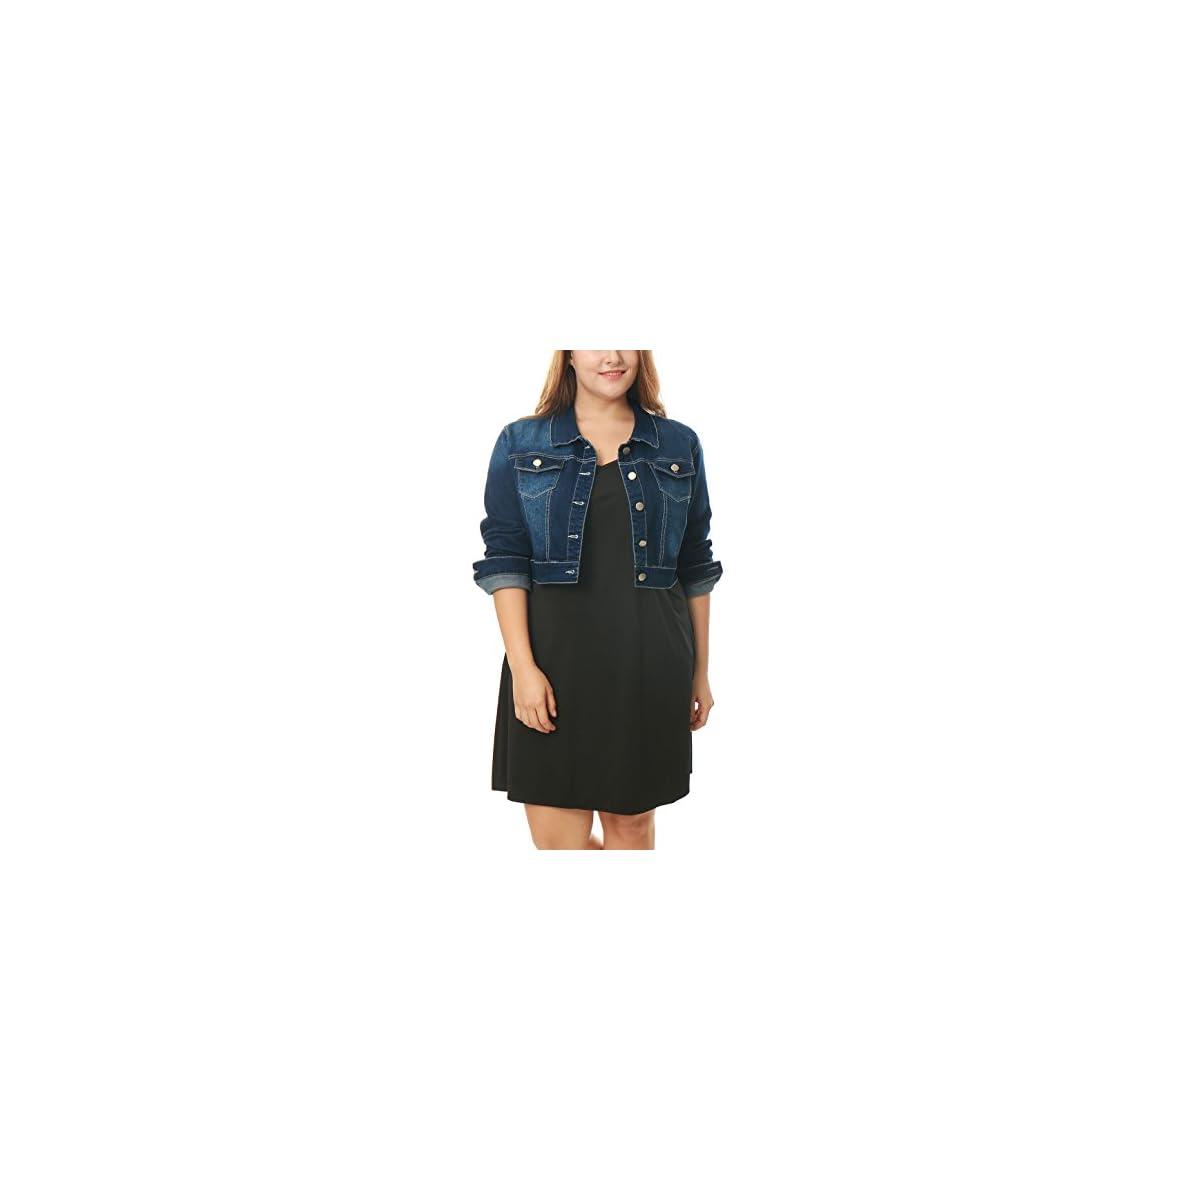 sourcingmap Damen Plus Size Langarm Button Crop Jeansjacke Jacke Dunkelblau